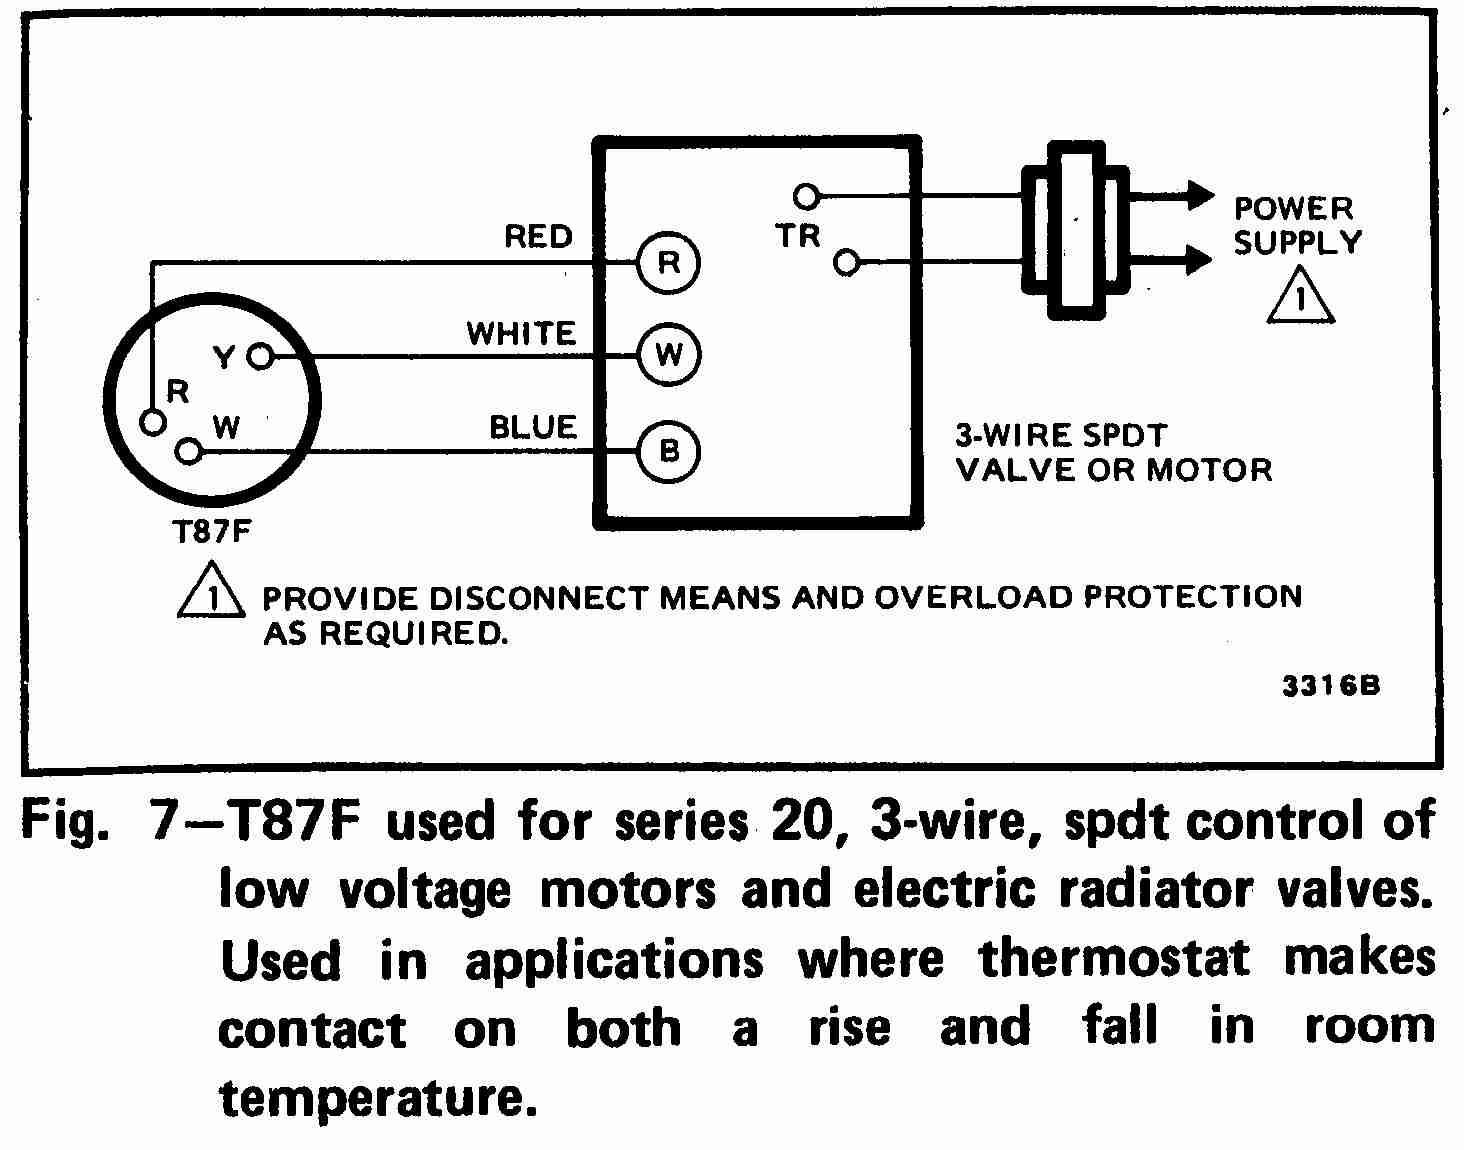 Refrigerator Thermostat Wiring Diagram 3 Wire Tail Light Diagram 2005ram Periihh Jeanjaures37 Fr